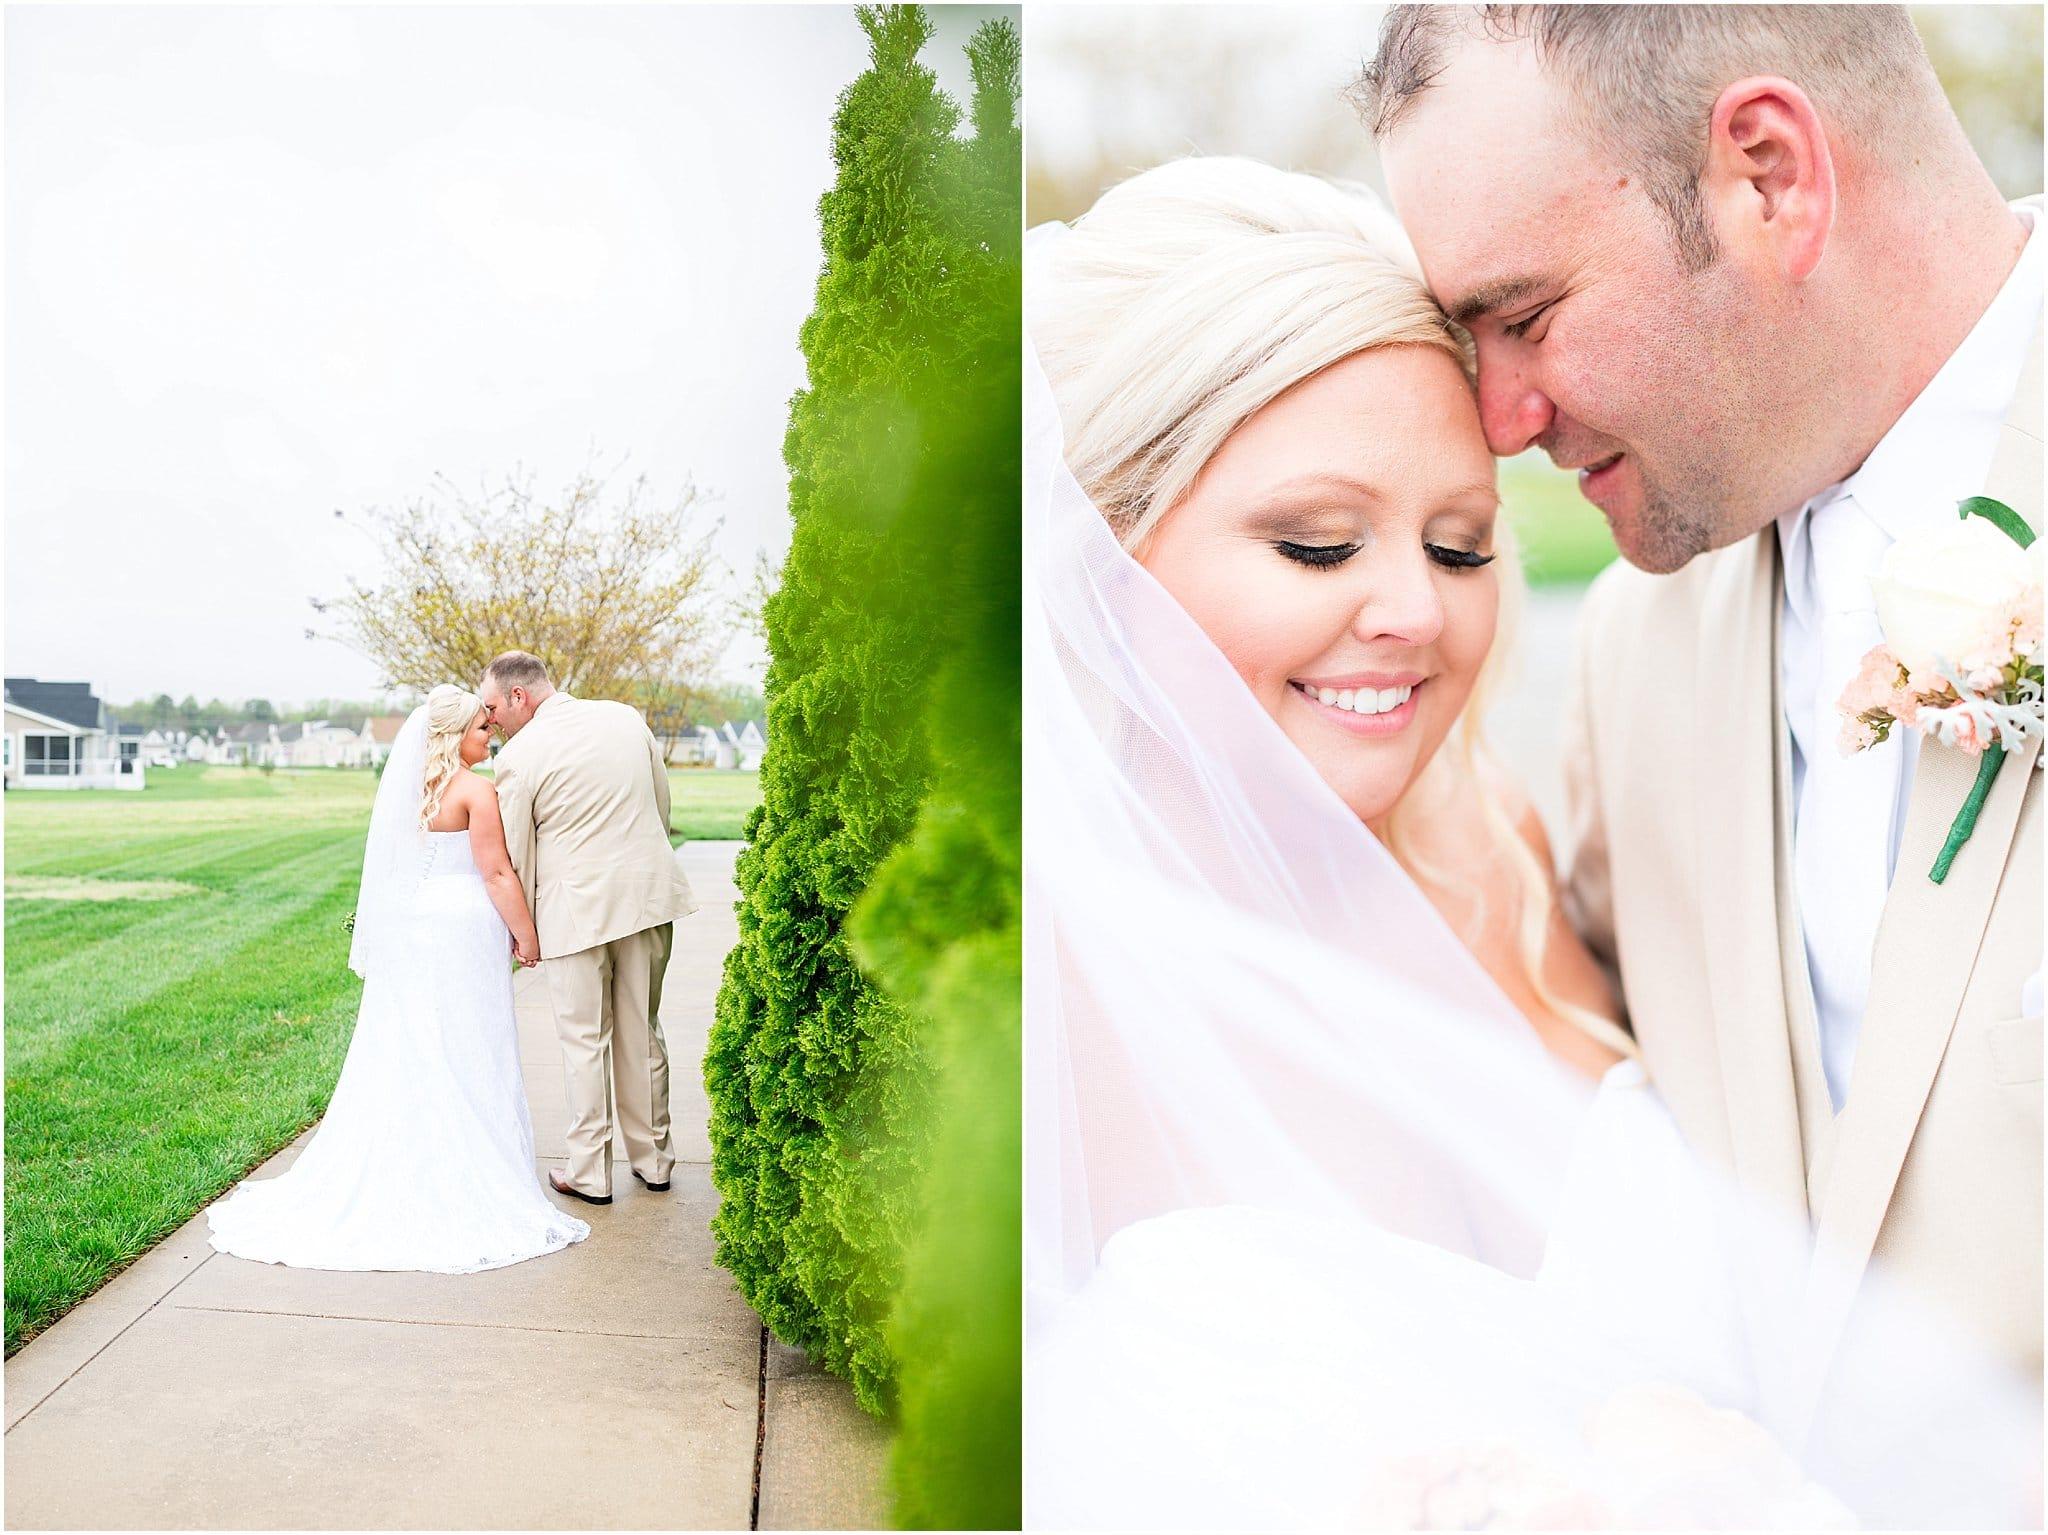 jessscott-milsboro-delaware-wedding-cassidymrphotography_0051